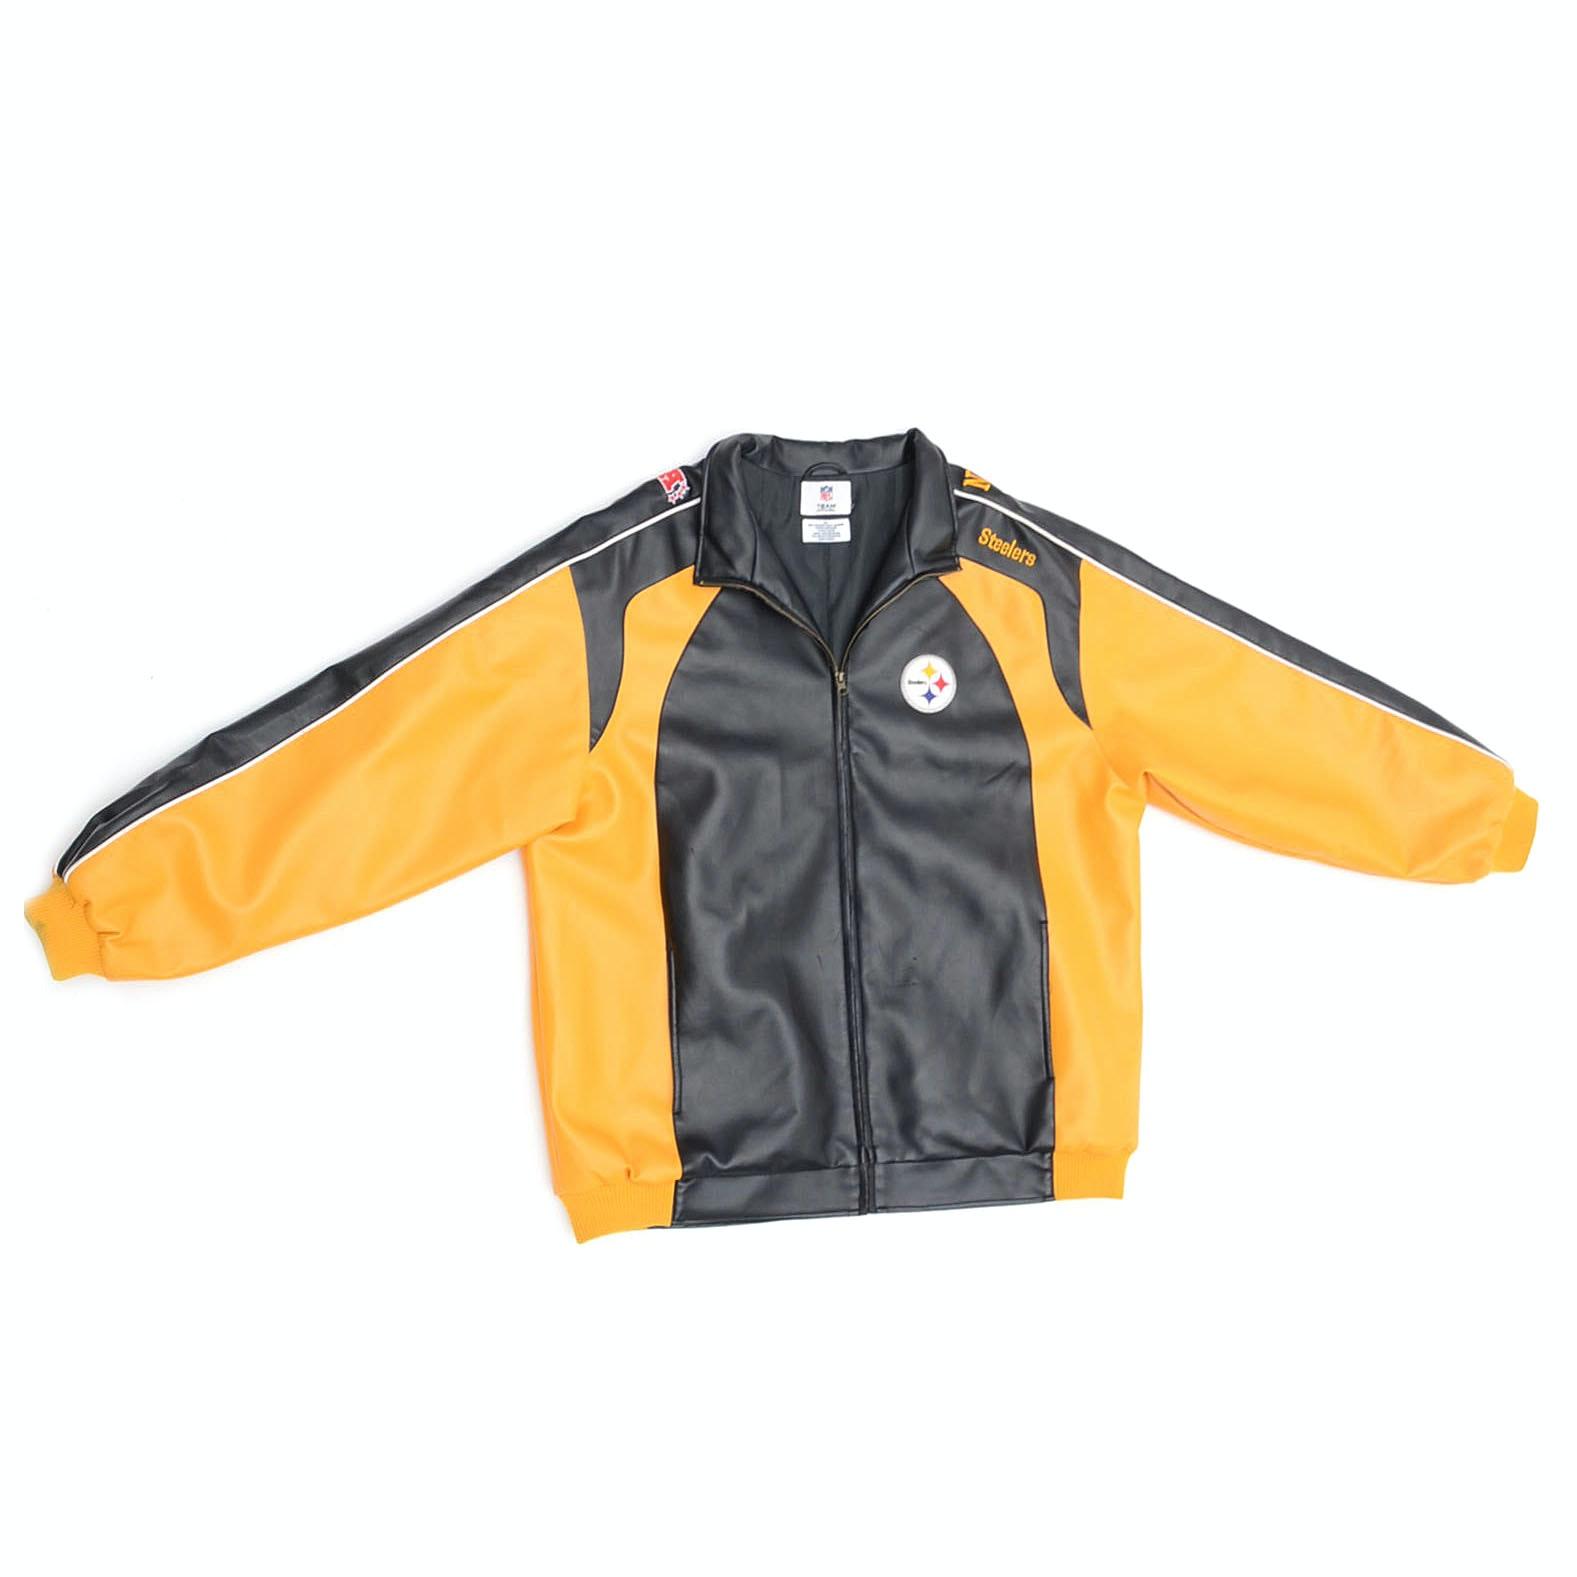 NFL Pittsburgh Steelers Leather Football Jacket